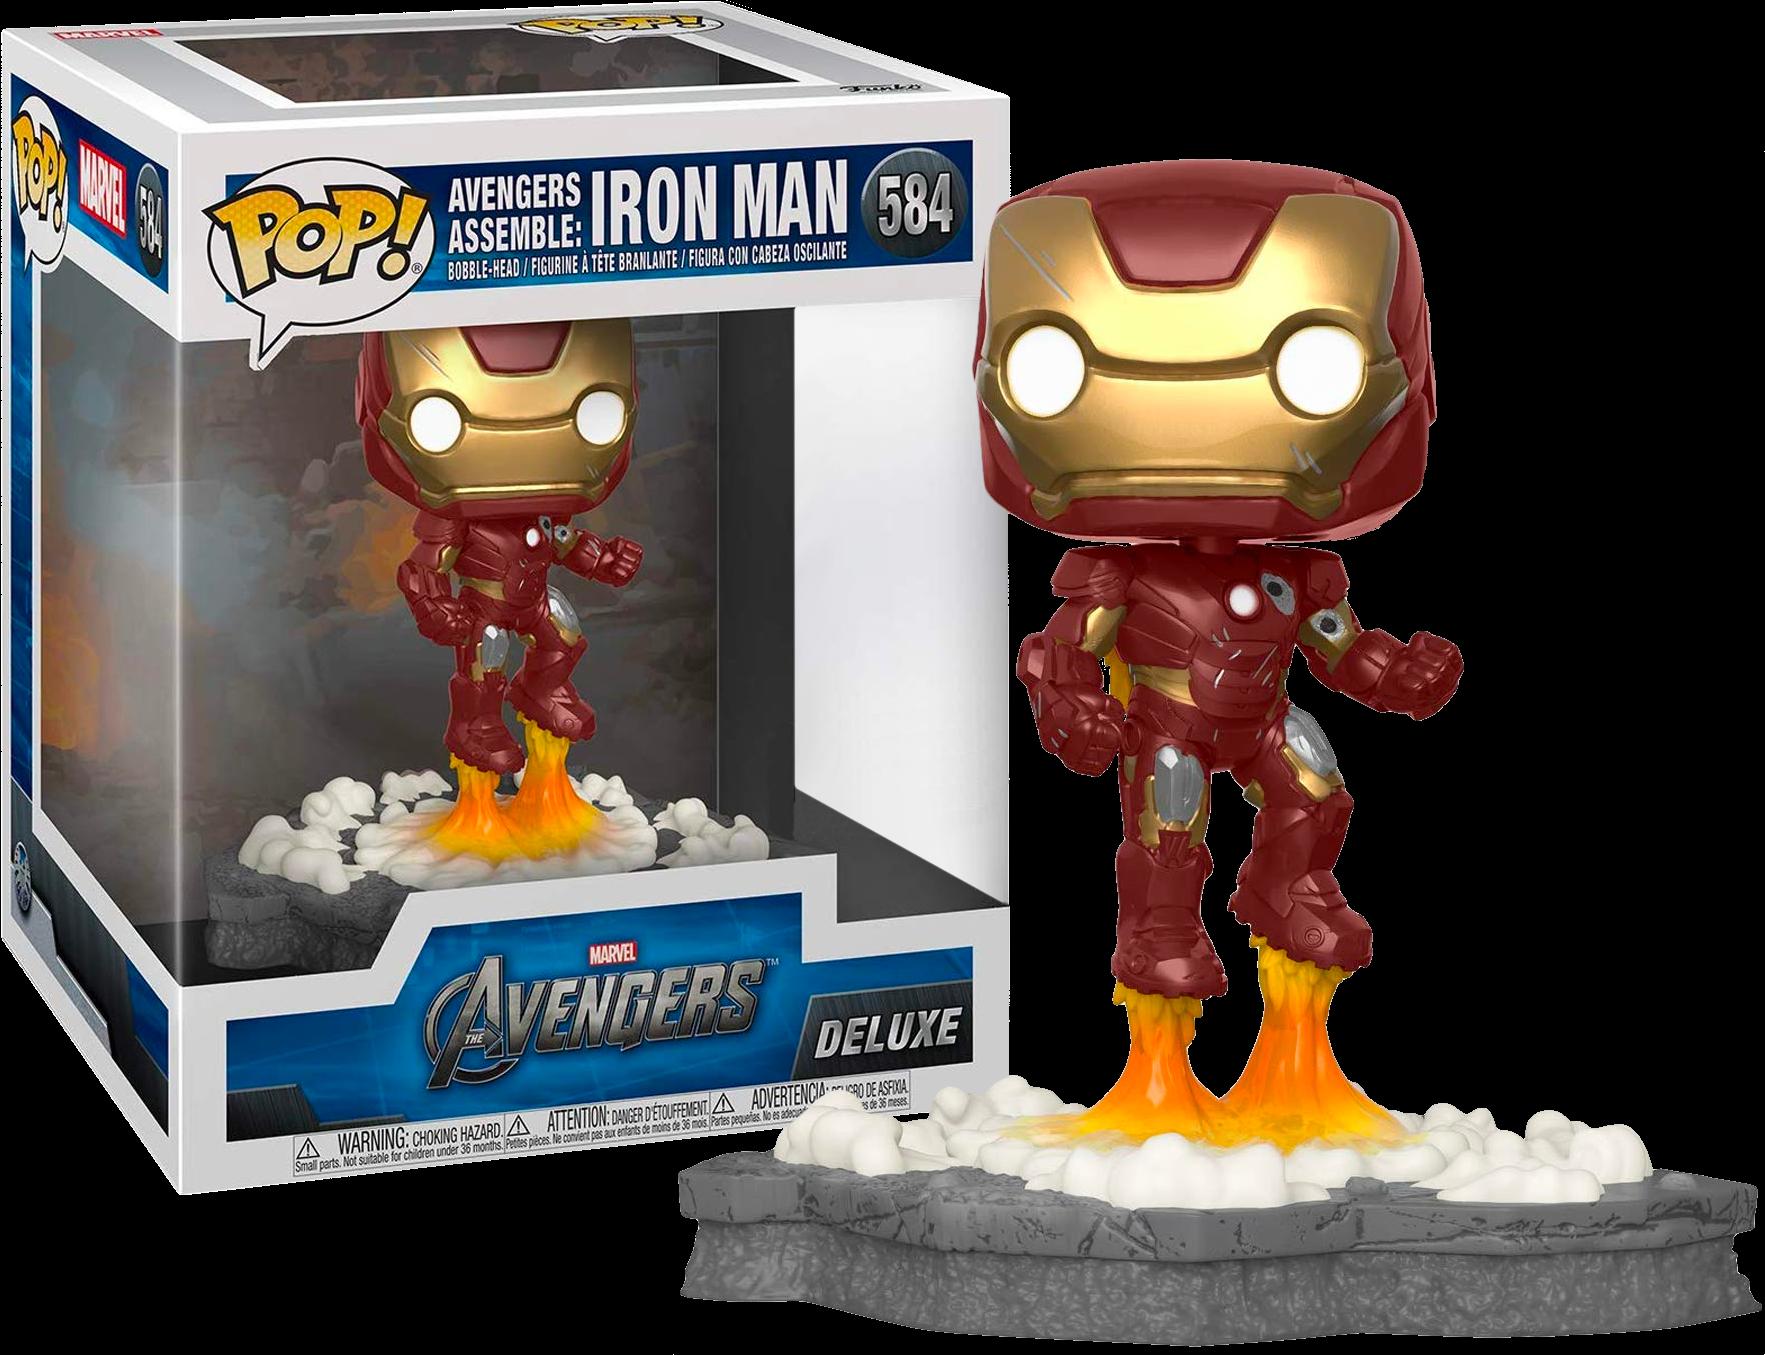 The Avengers POP! Deluxe Vinyl Figure Iron Man Avengers Assemble Diorama Limited 14 cm